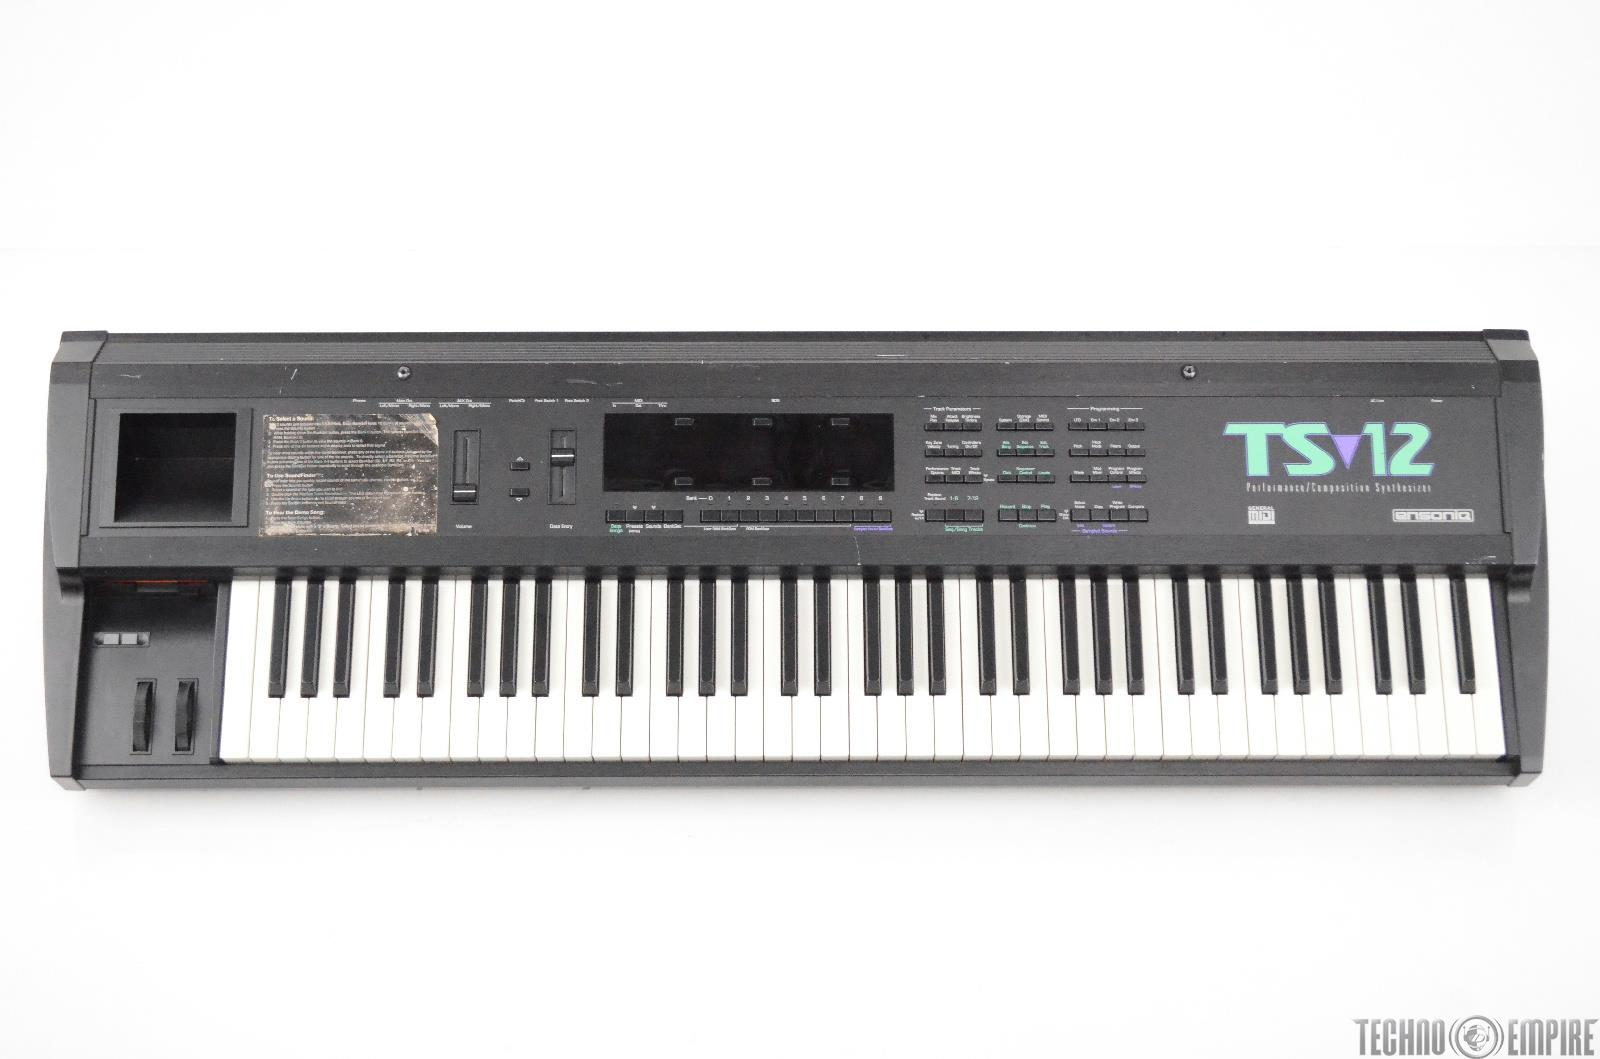 Ensoniq TS-12 76-Key Performance/Composition Synthesizer Keyboard Synth #31309